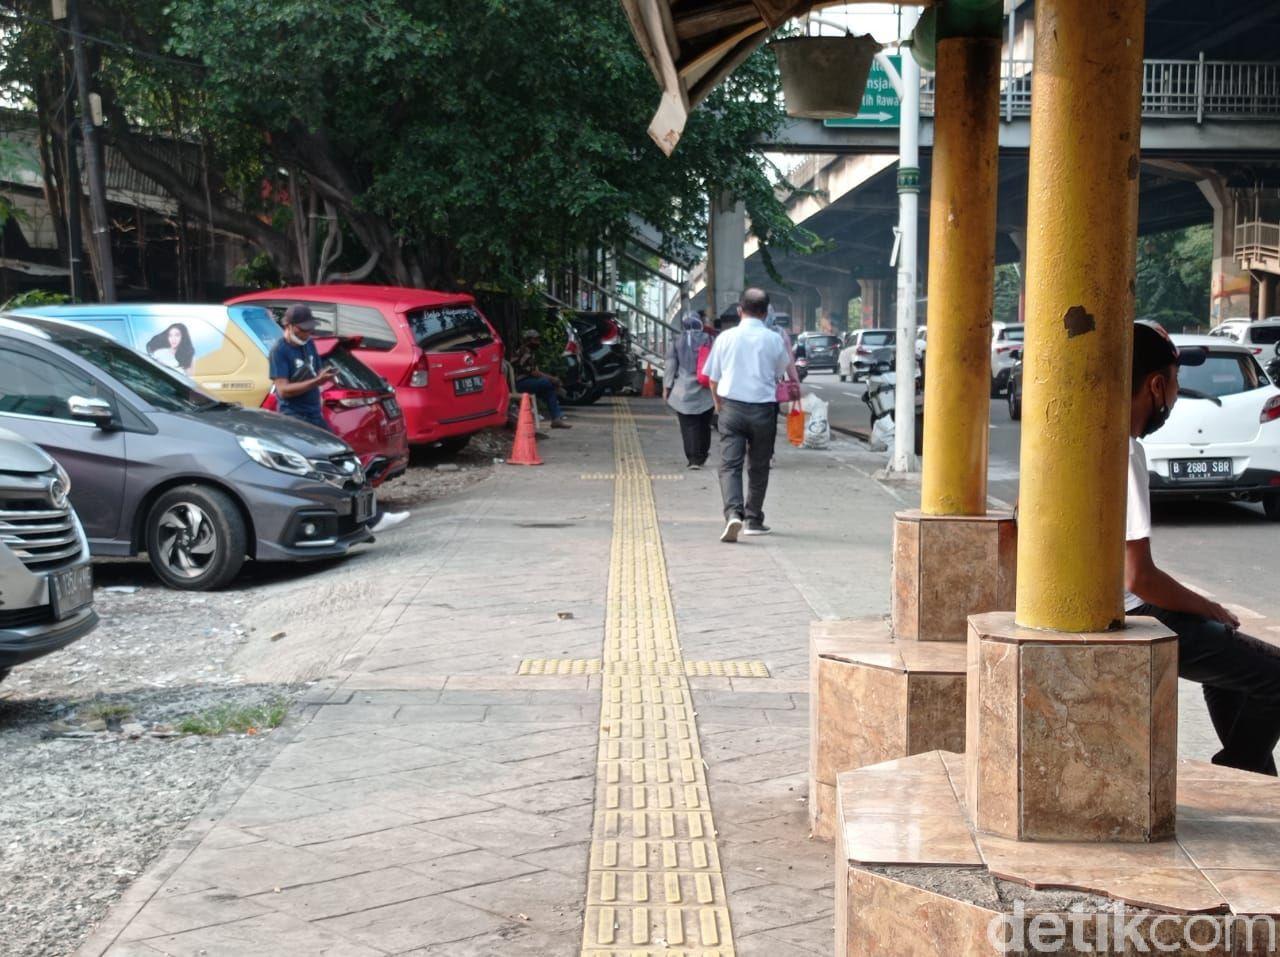 Dishub tertibkan trotoar di dekat Halte Kayu Putih, Rawasari, Jakarta Pusat, 7 Juni 2021 sore. (Wilda HN/detikcom)